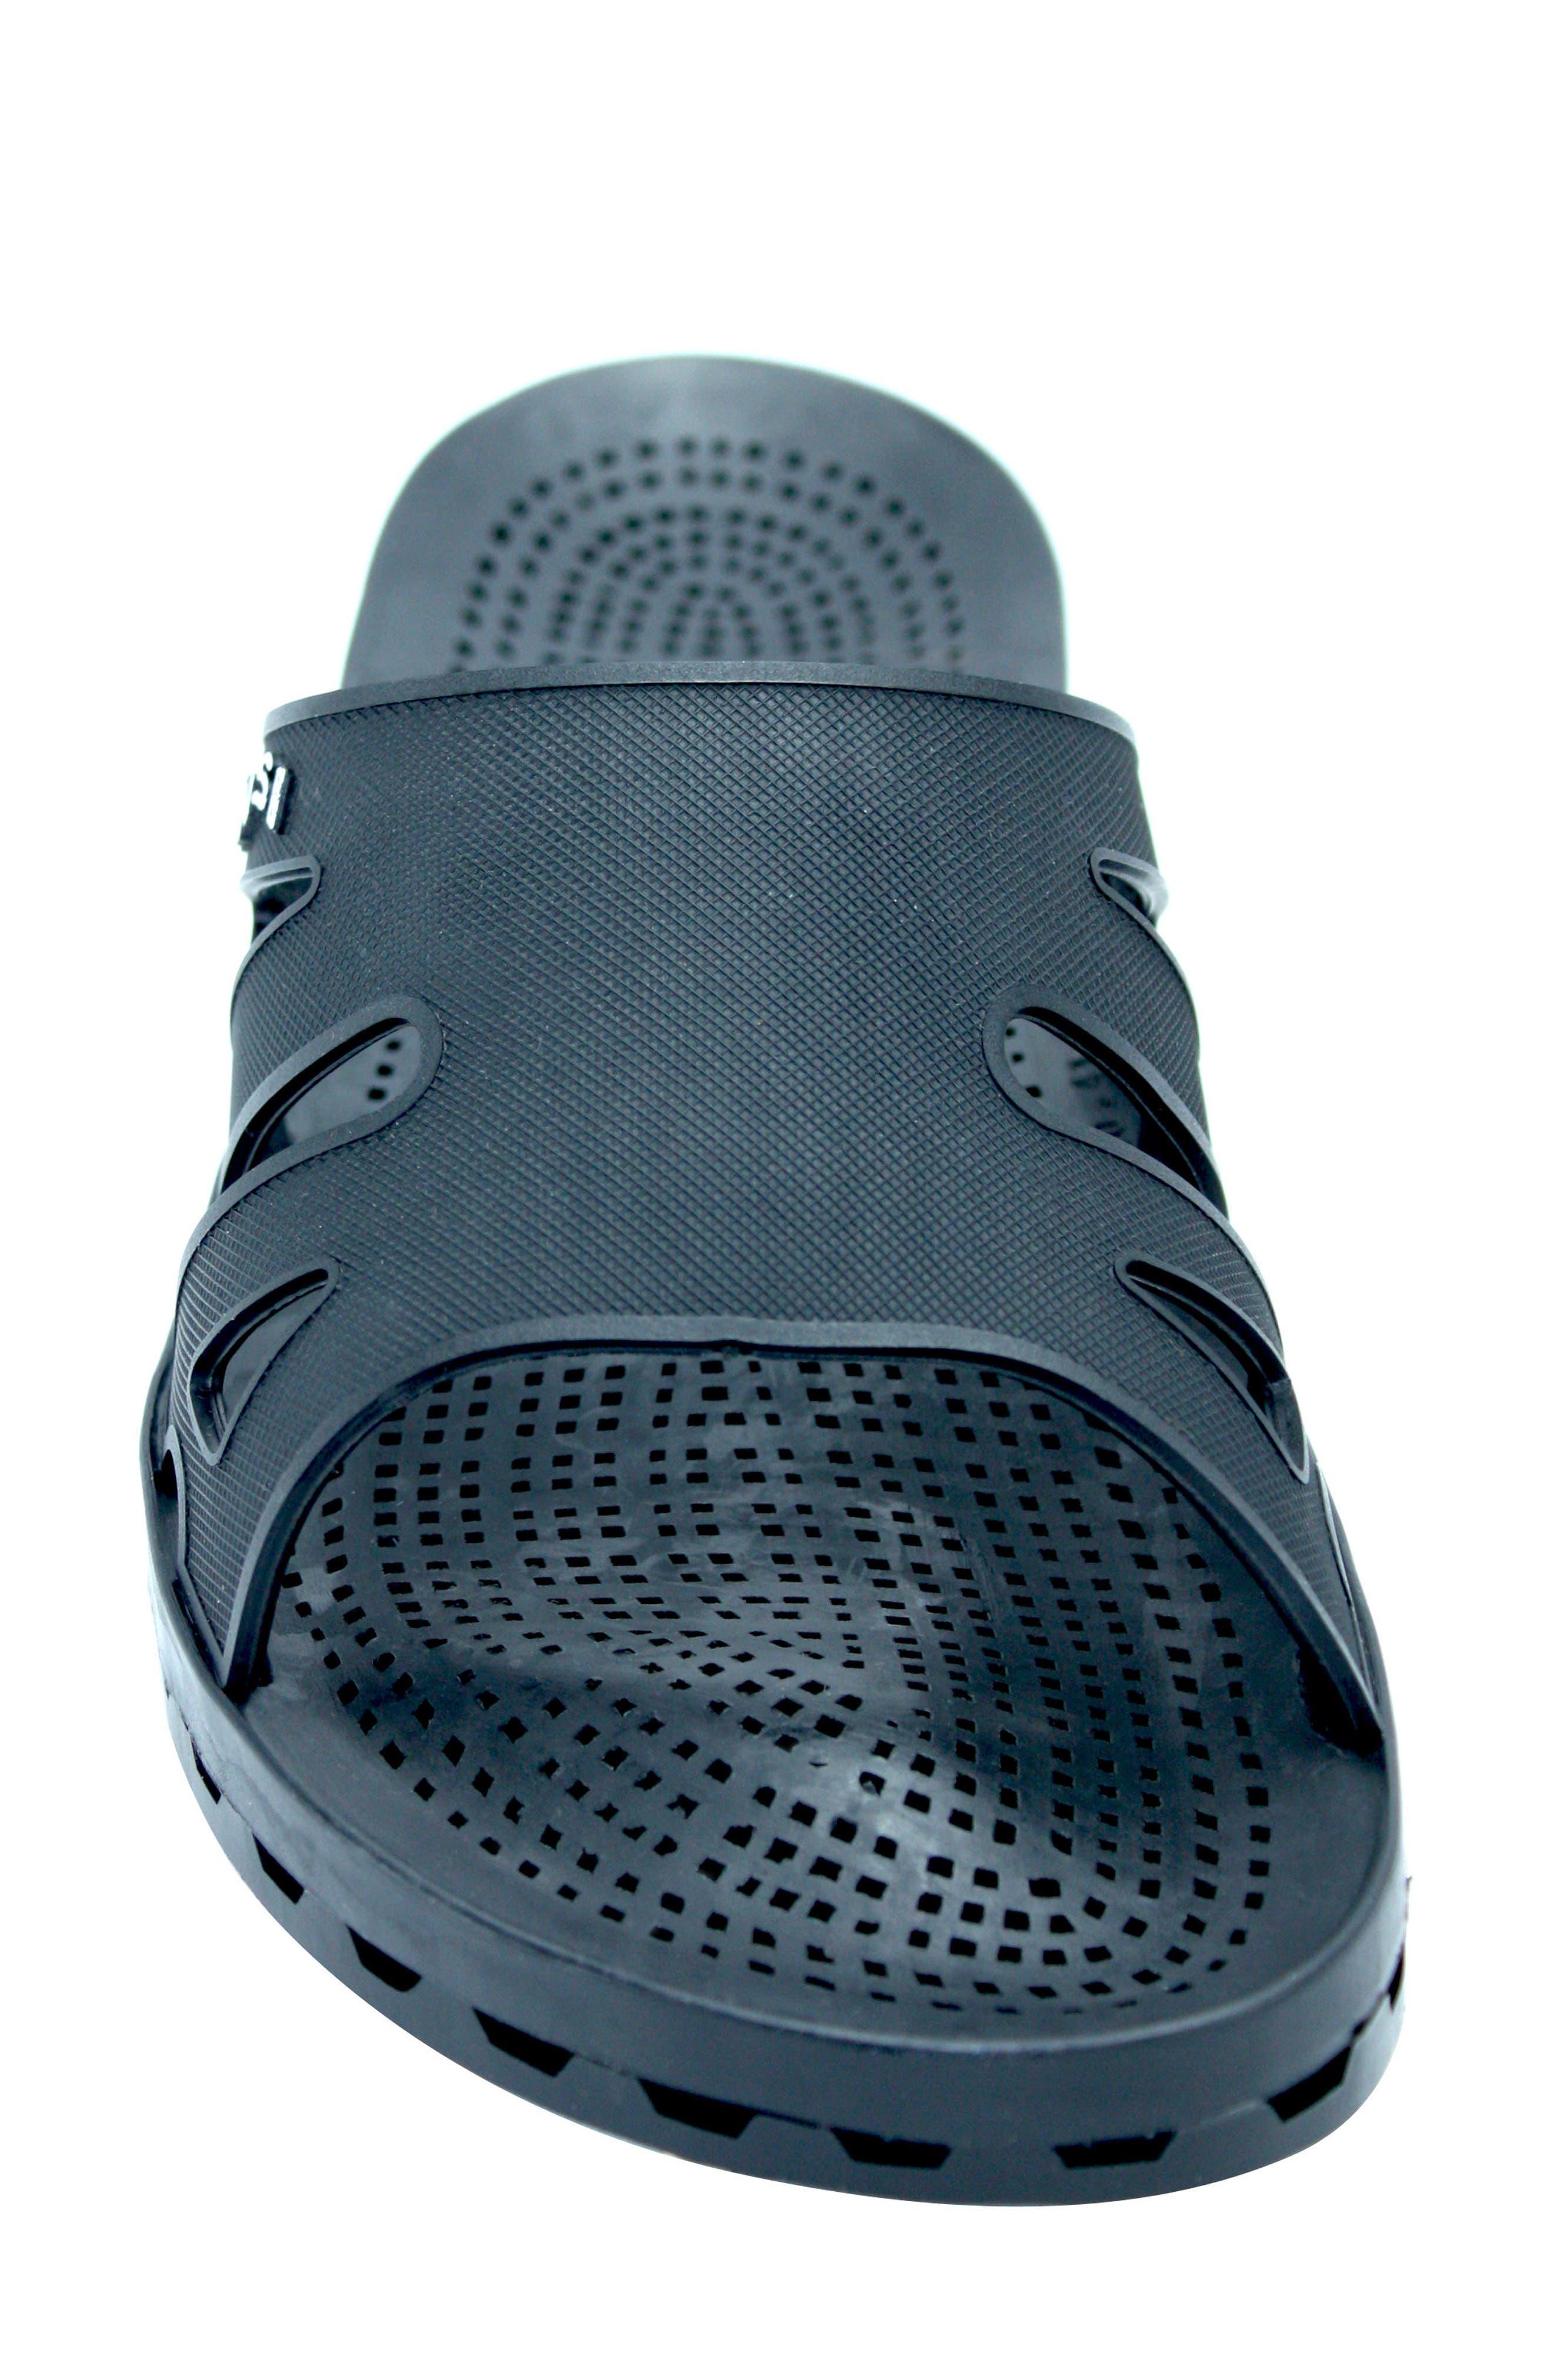 Regatta Slide Sandal,                             Alternate thumbnail 4, color,                             Solid Black Rubber